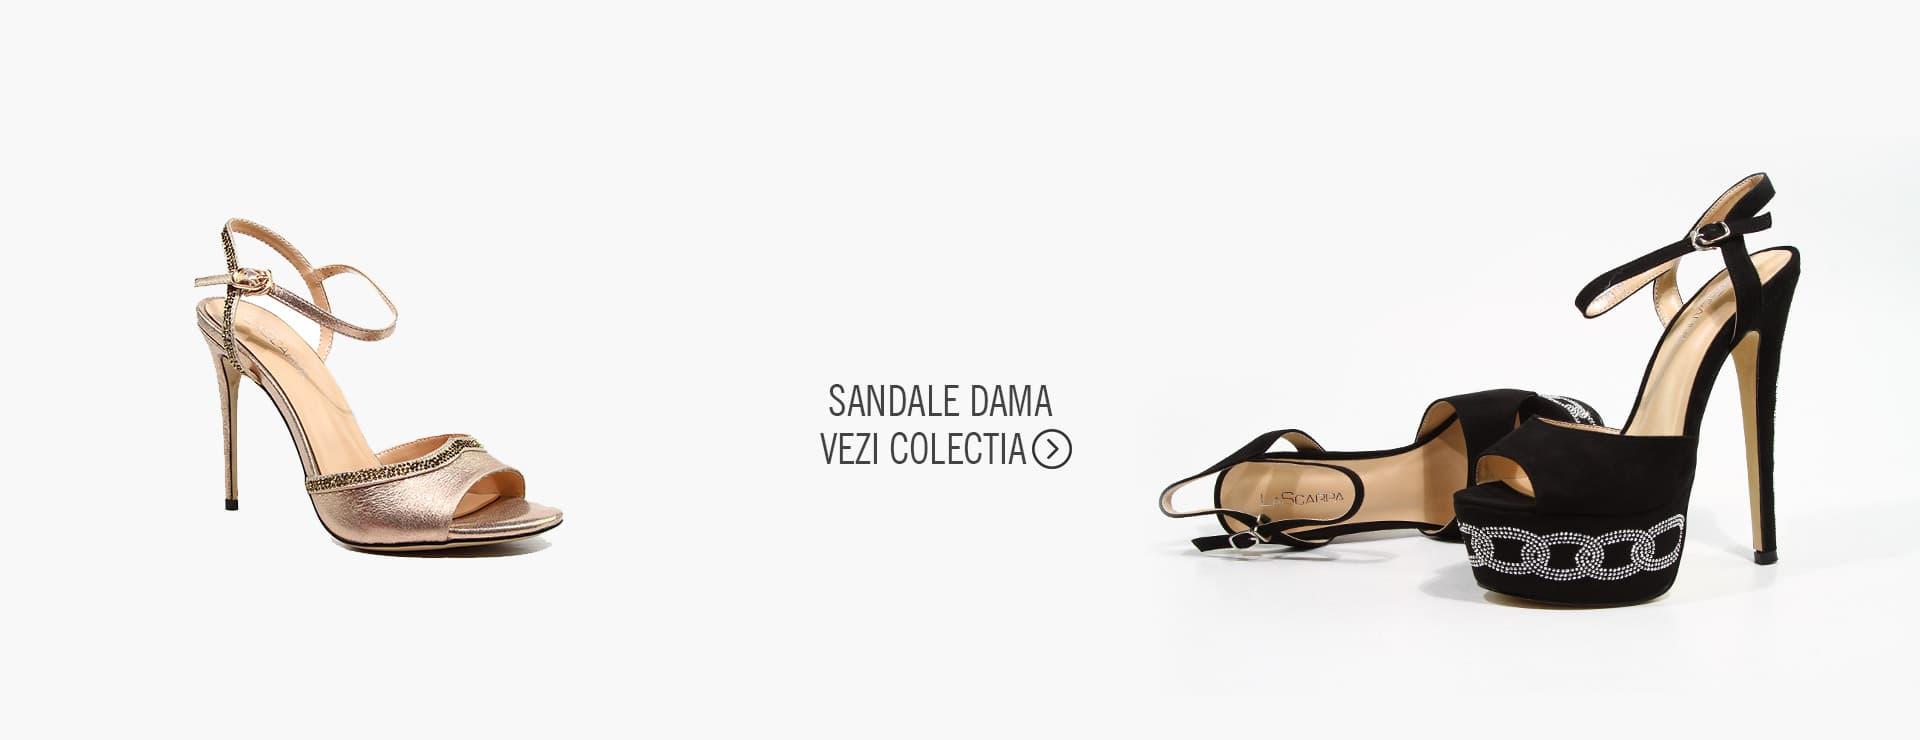 Sandale dama LaScarpa